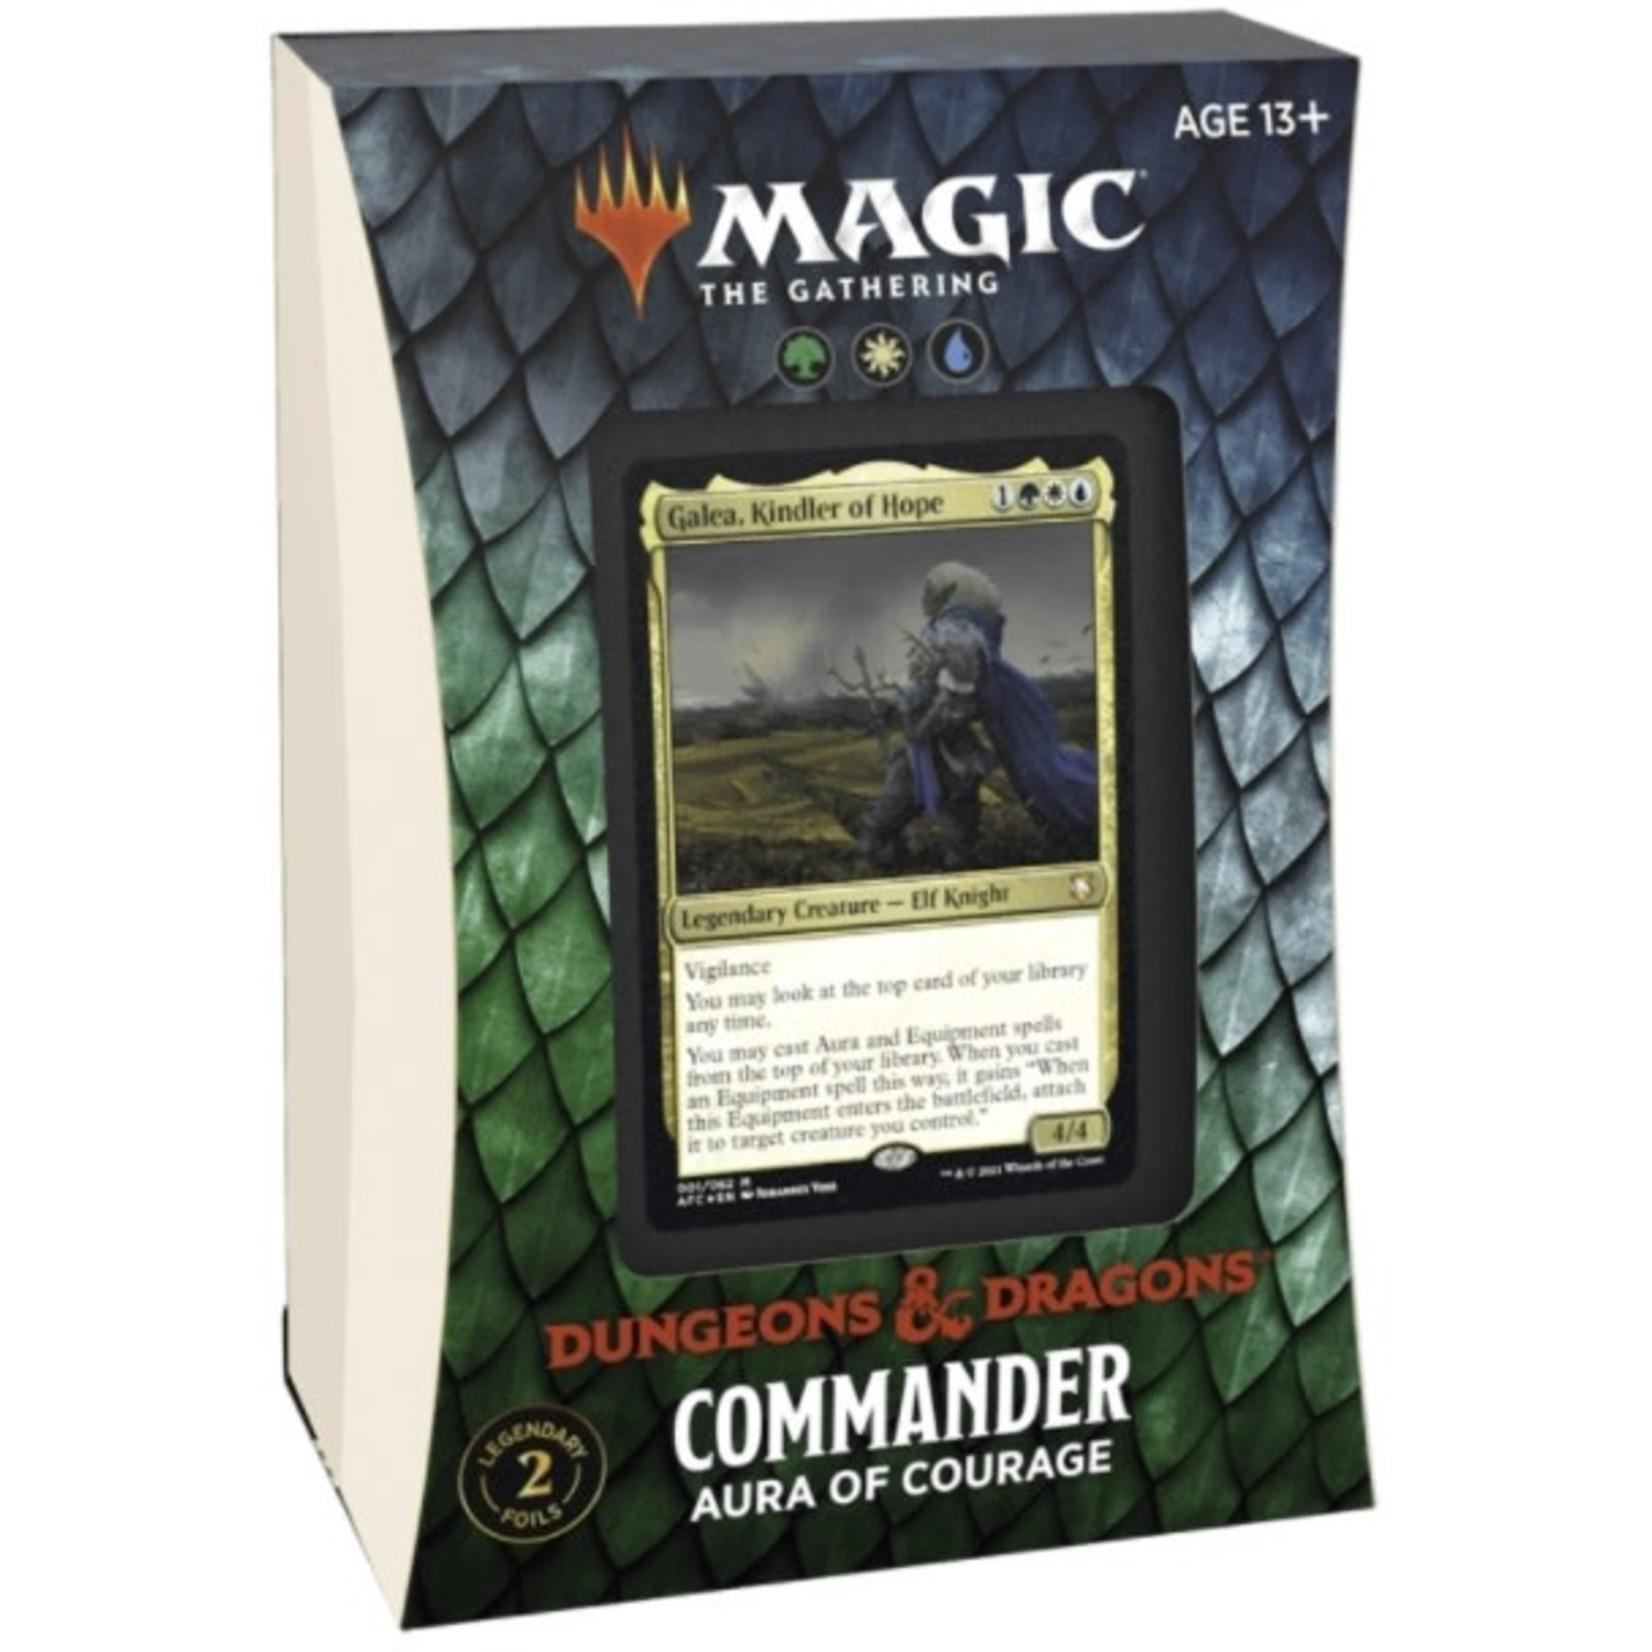 Magic The Gathering Magic the Gathering D&D Commander